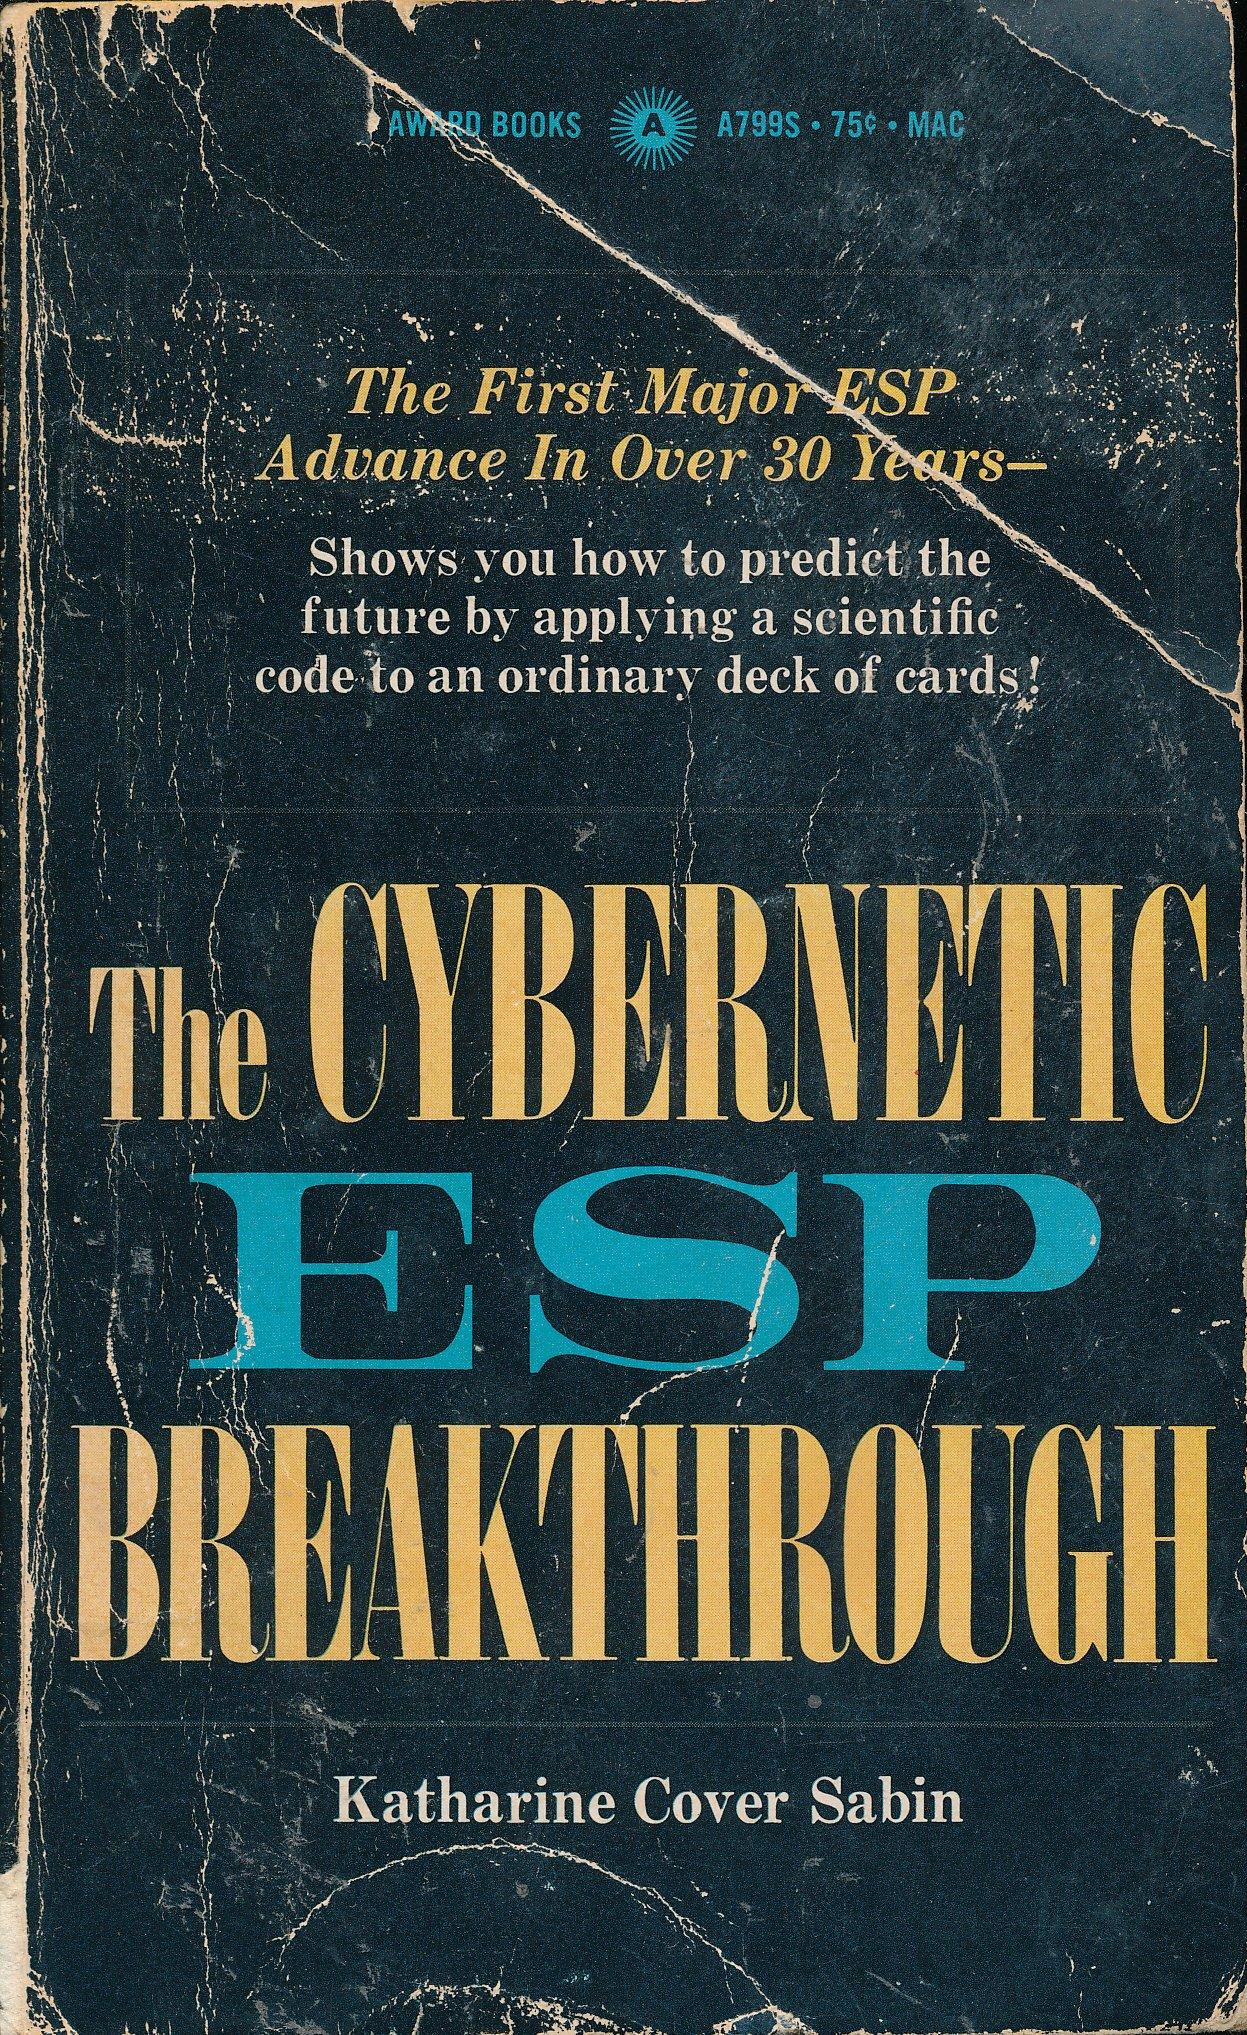 The Cybernetic ESP Breakthrough